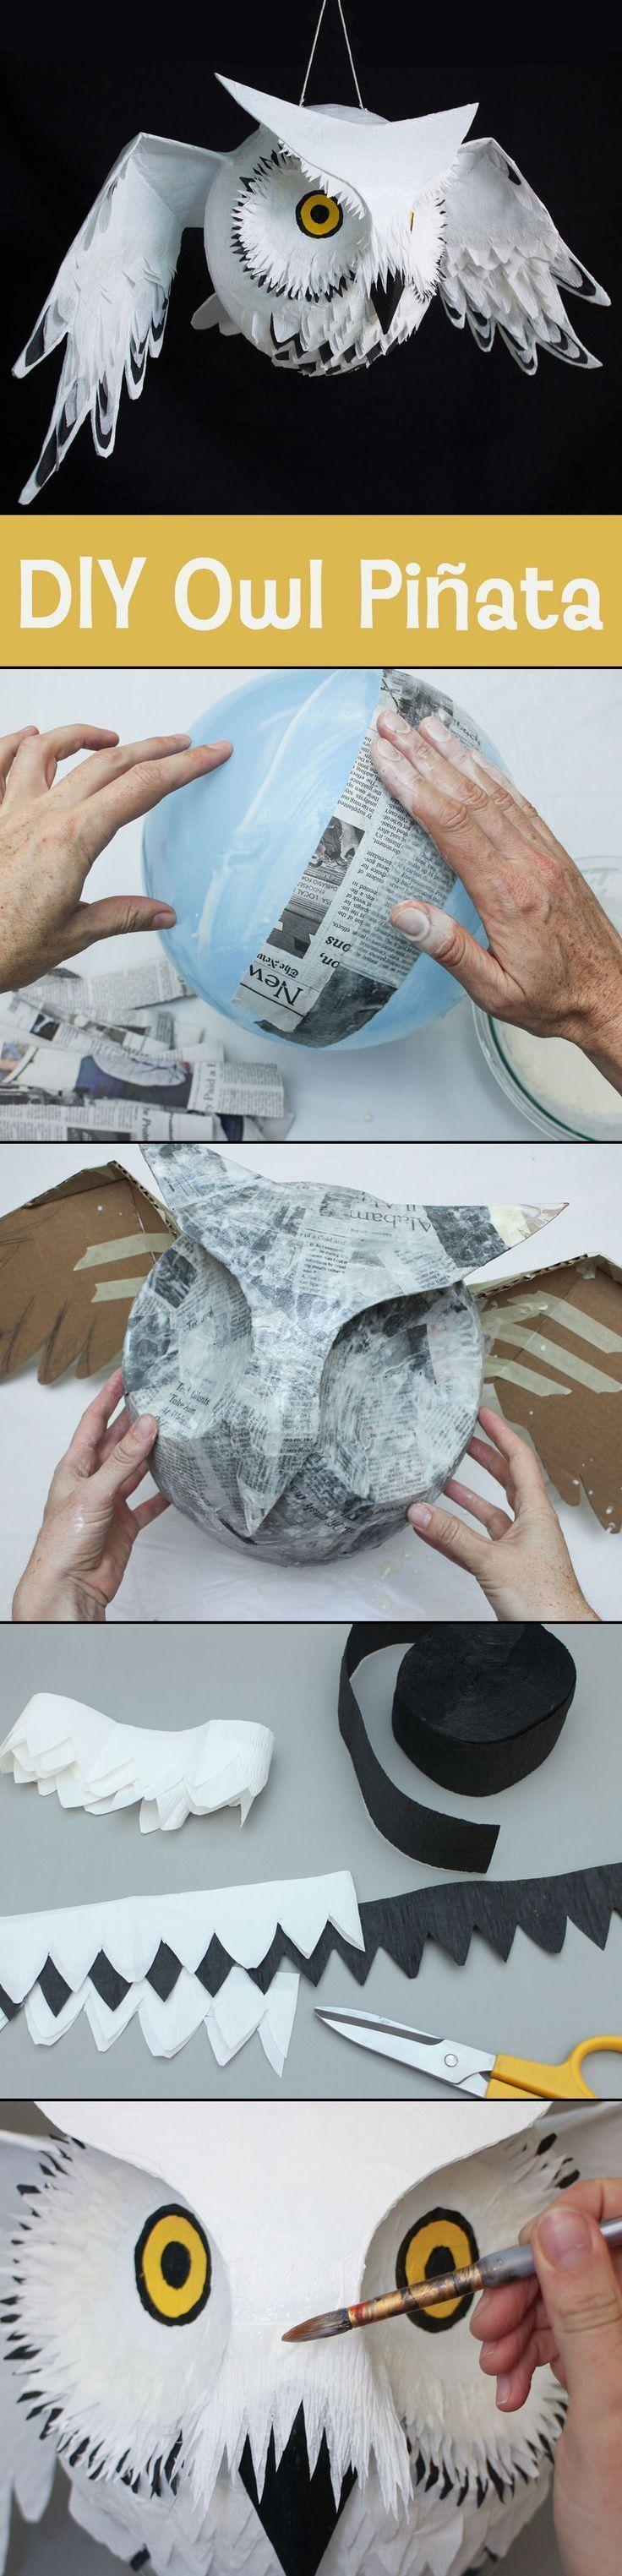 Photo of DIY Owl Piñata